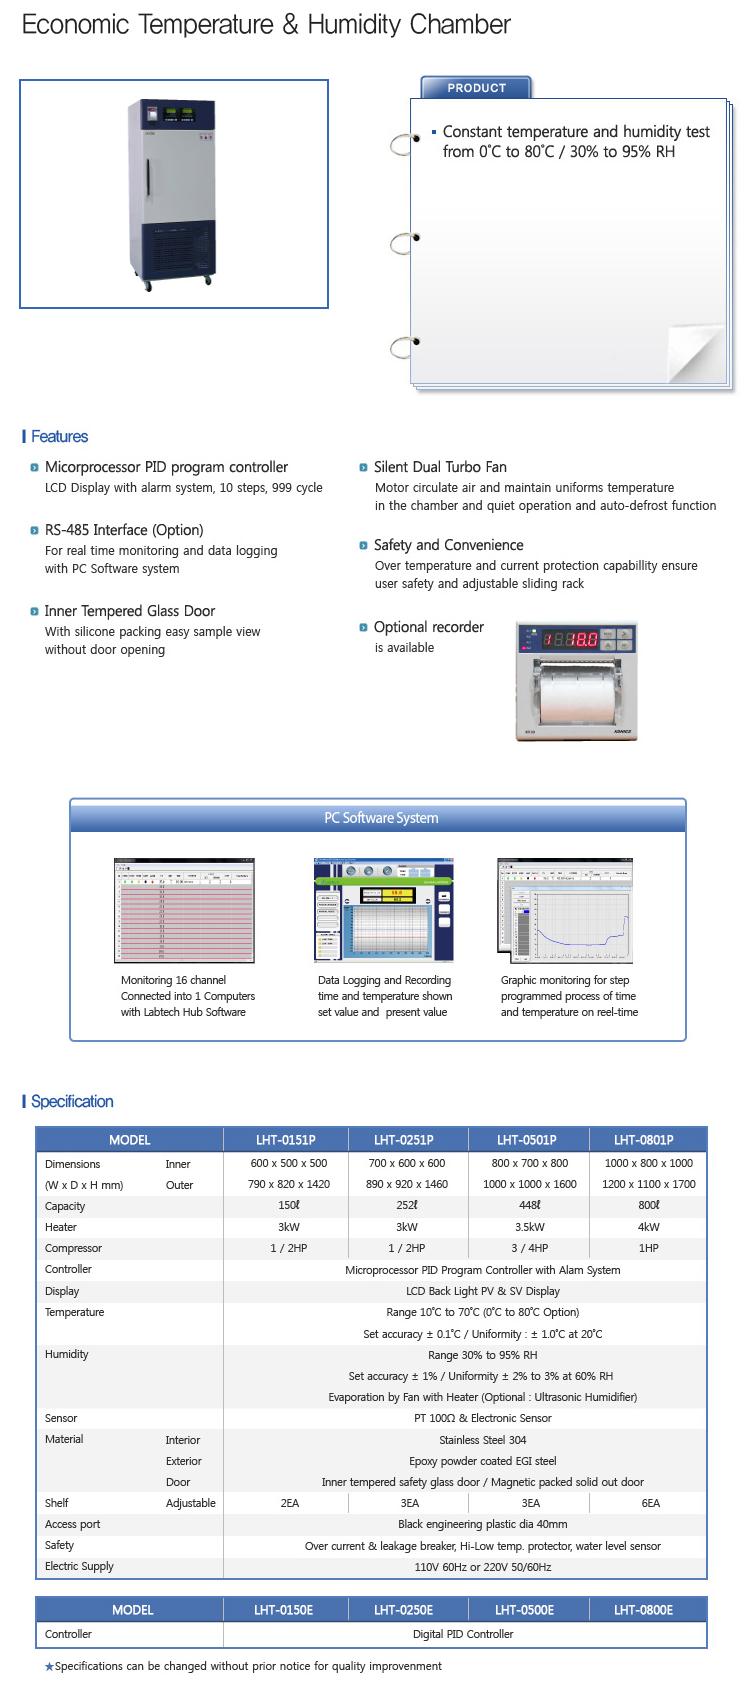 LABTECH - Economic Temperature & Humidity Chamber - LHT-P/E